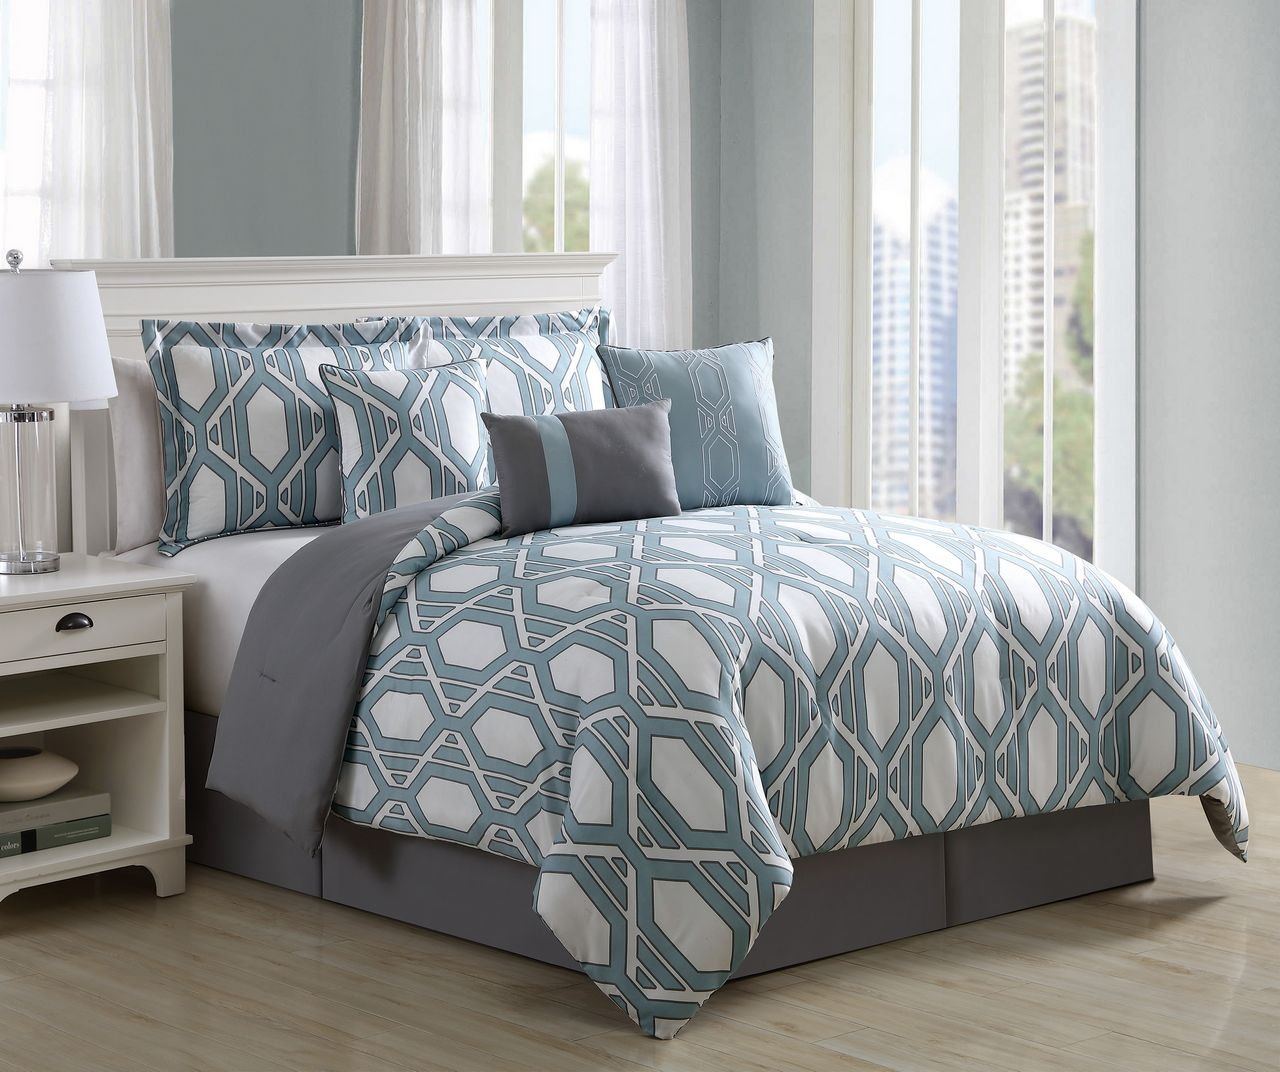 7 Piece Lima Spa/Ivory Comforter Set King